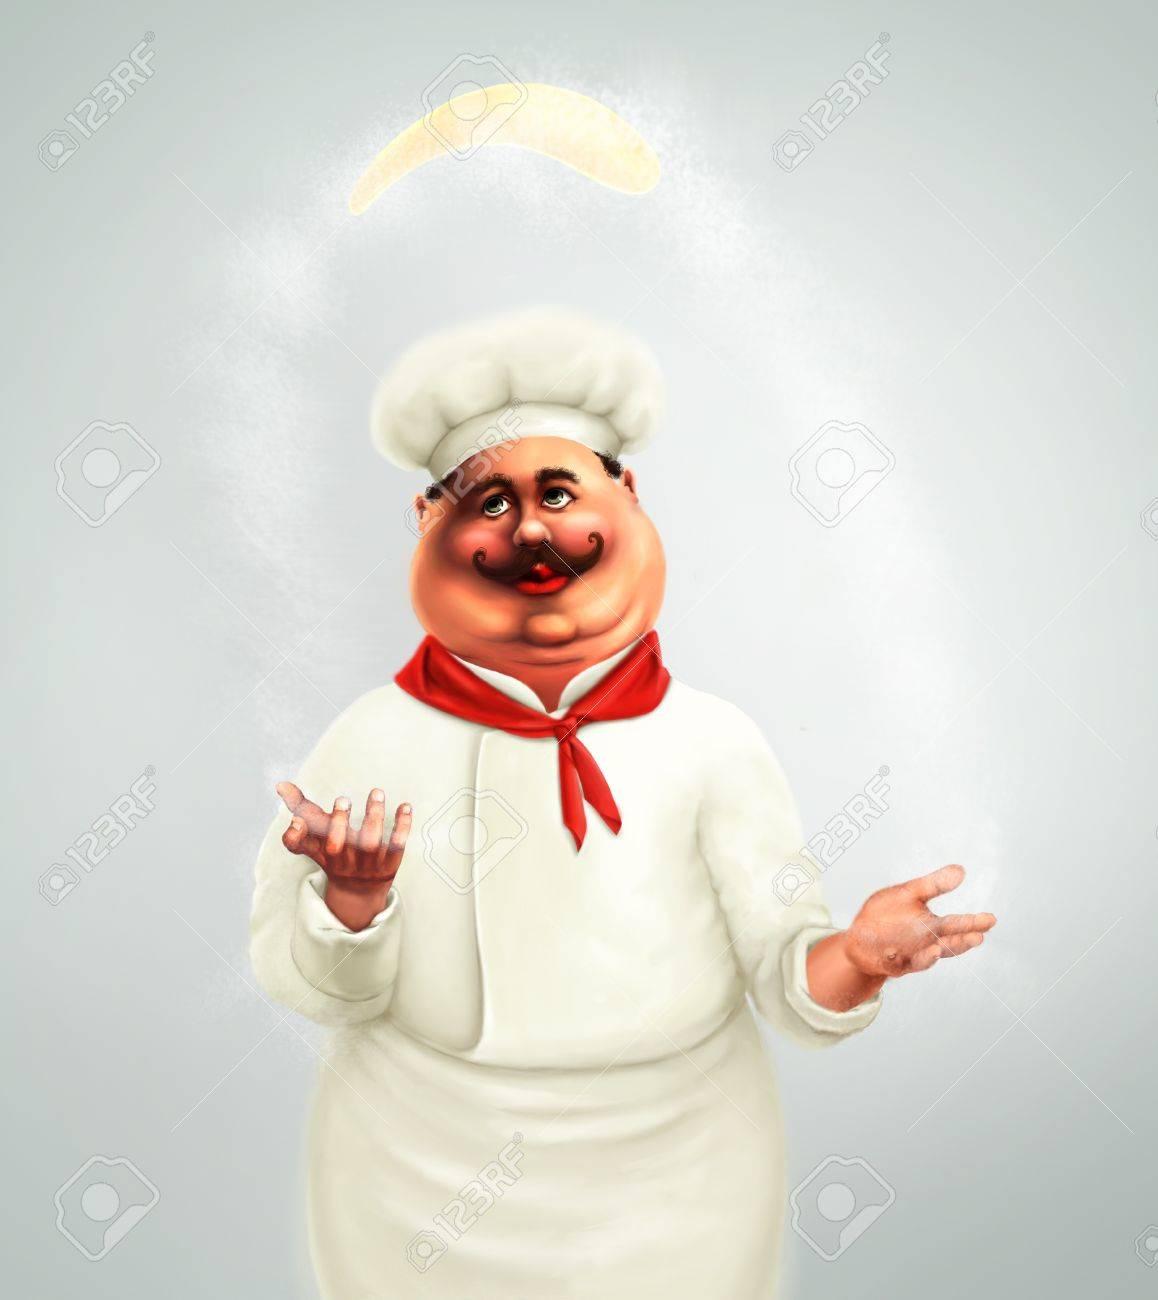 chef making pizza Stock Photo - 10344589